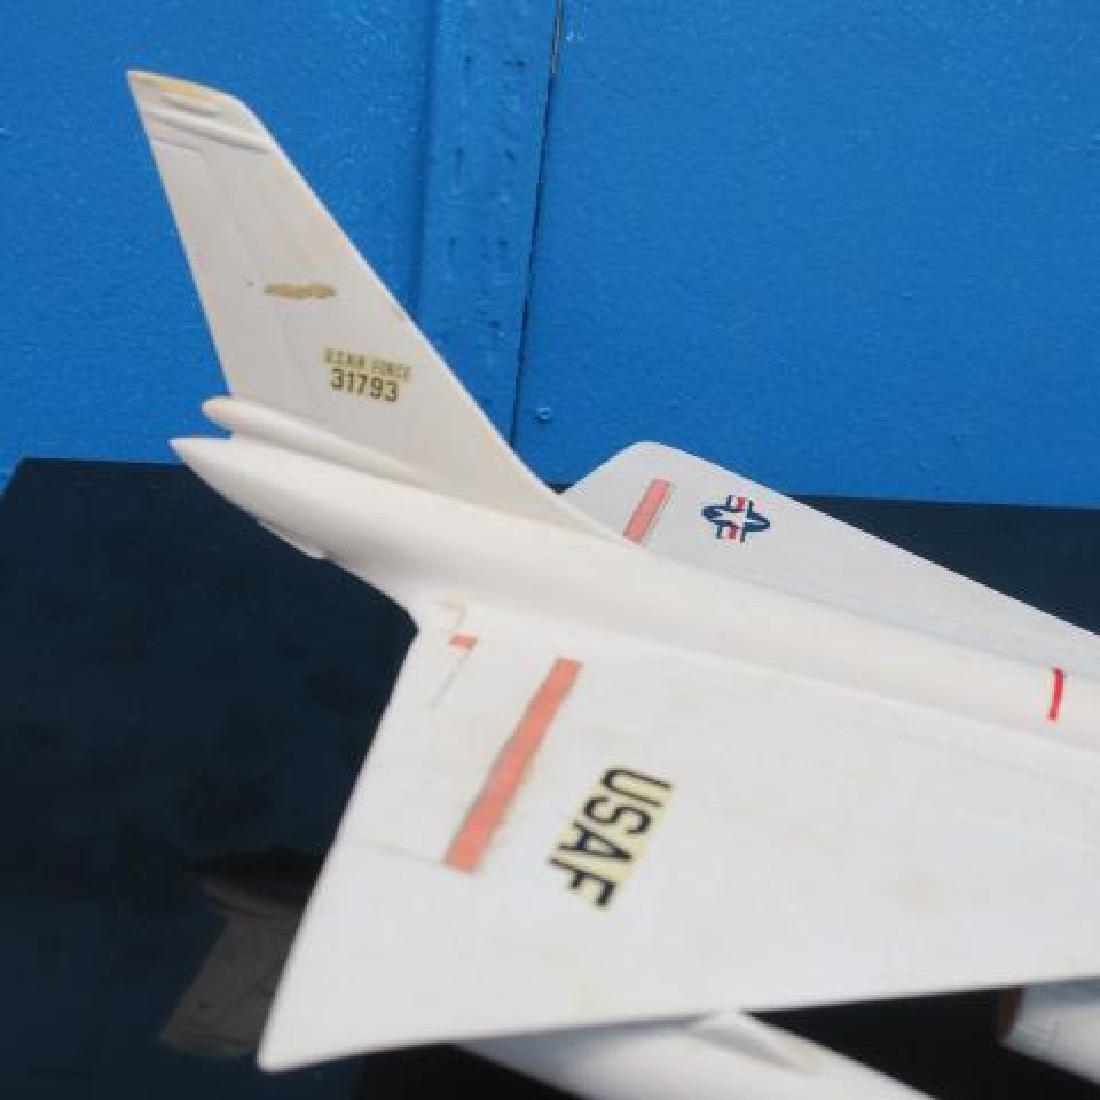 US NAVY RECOGNITION MODEL B-58 HUSTLER, MACH 2 BOMBER: - 2